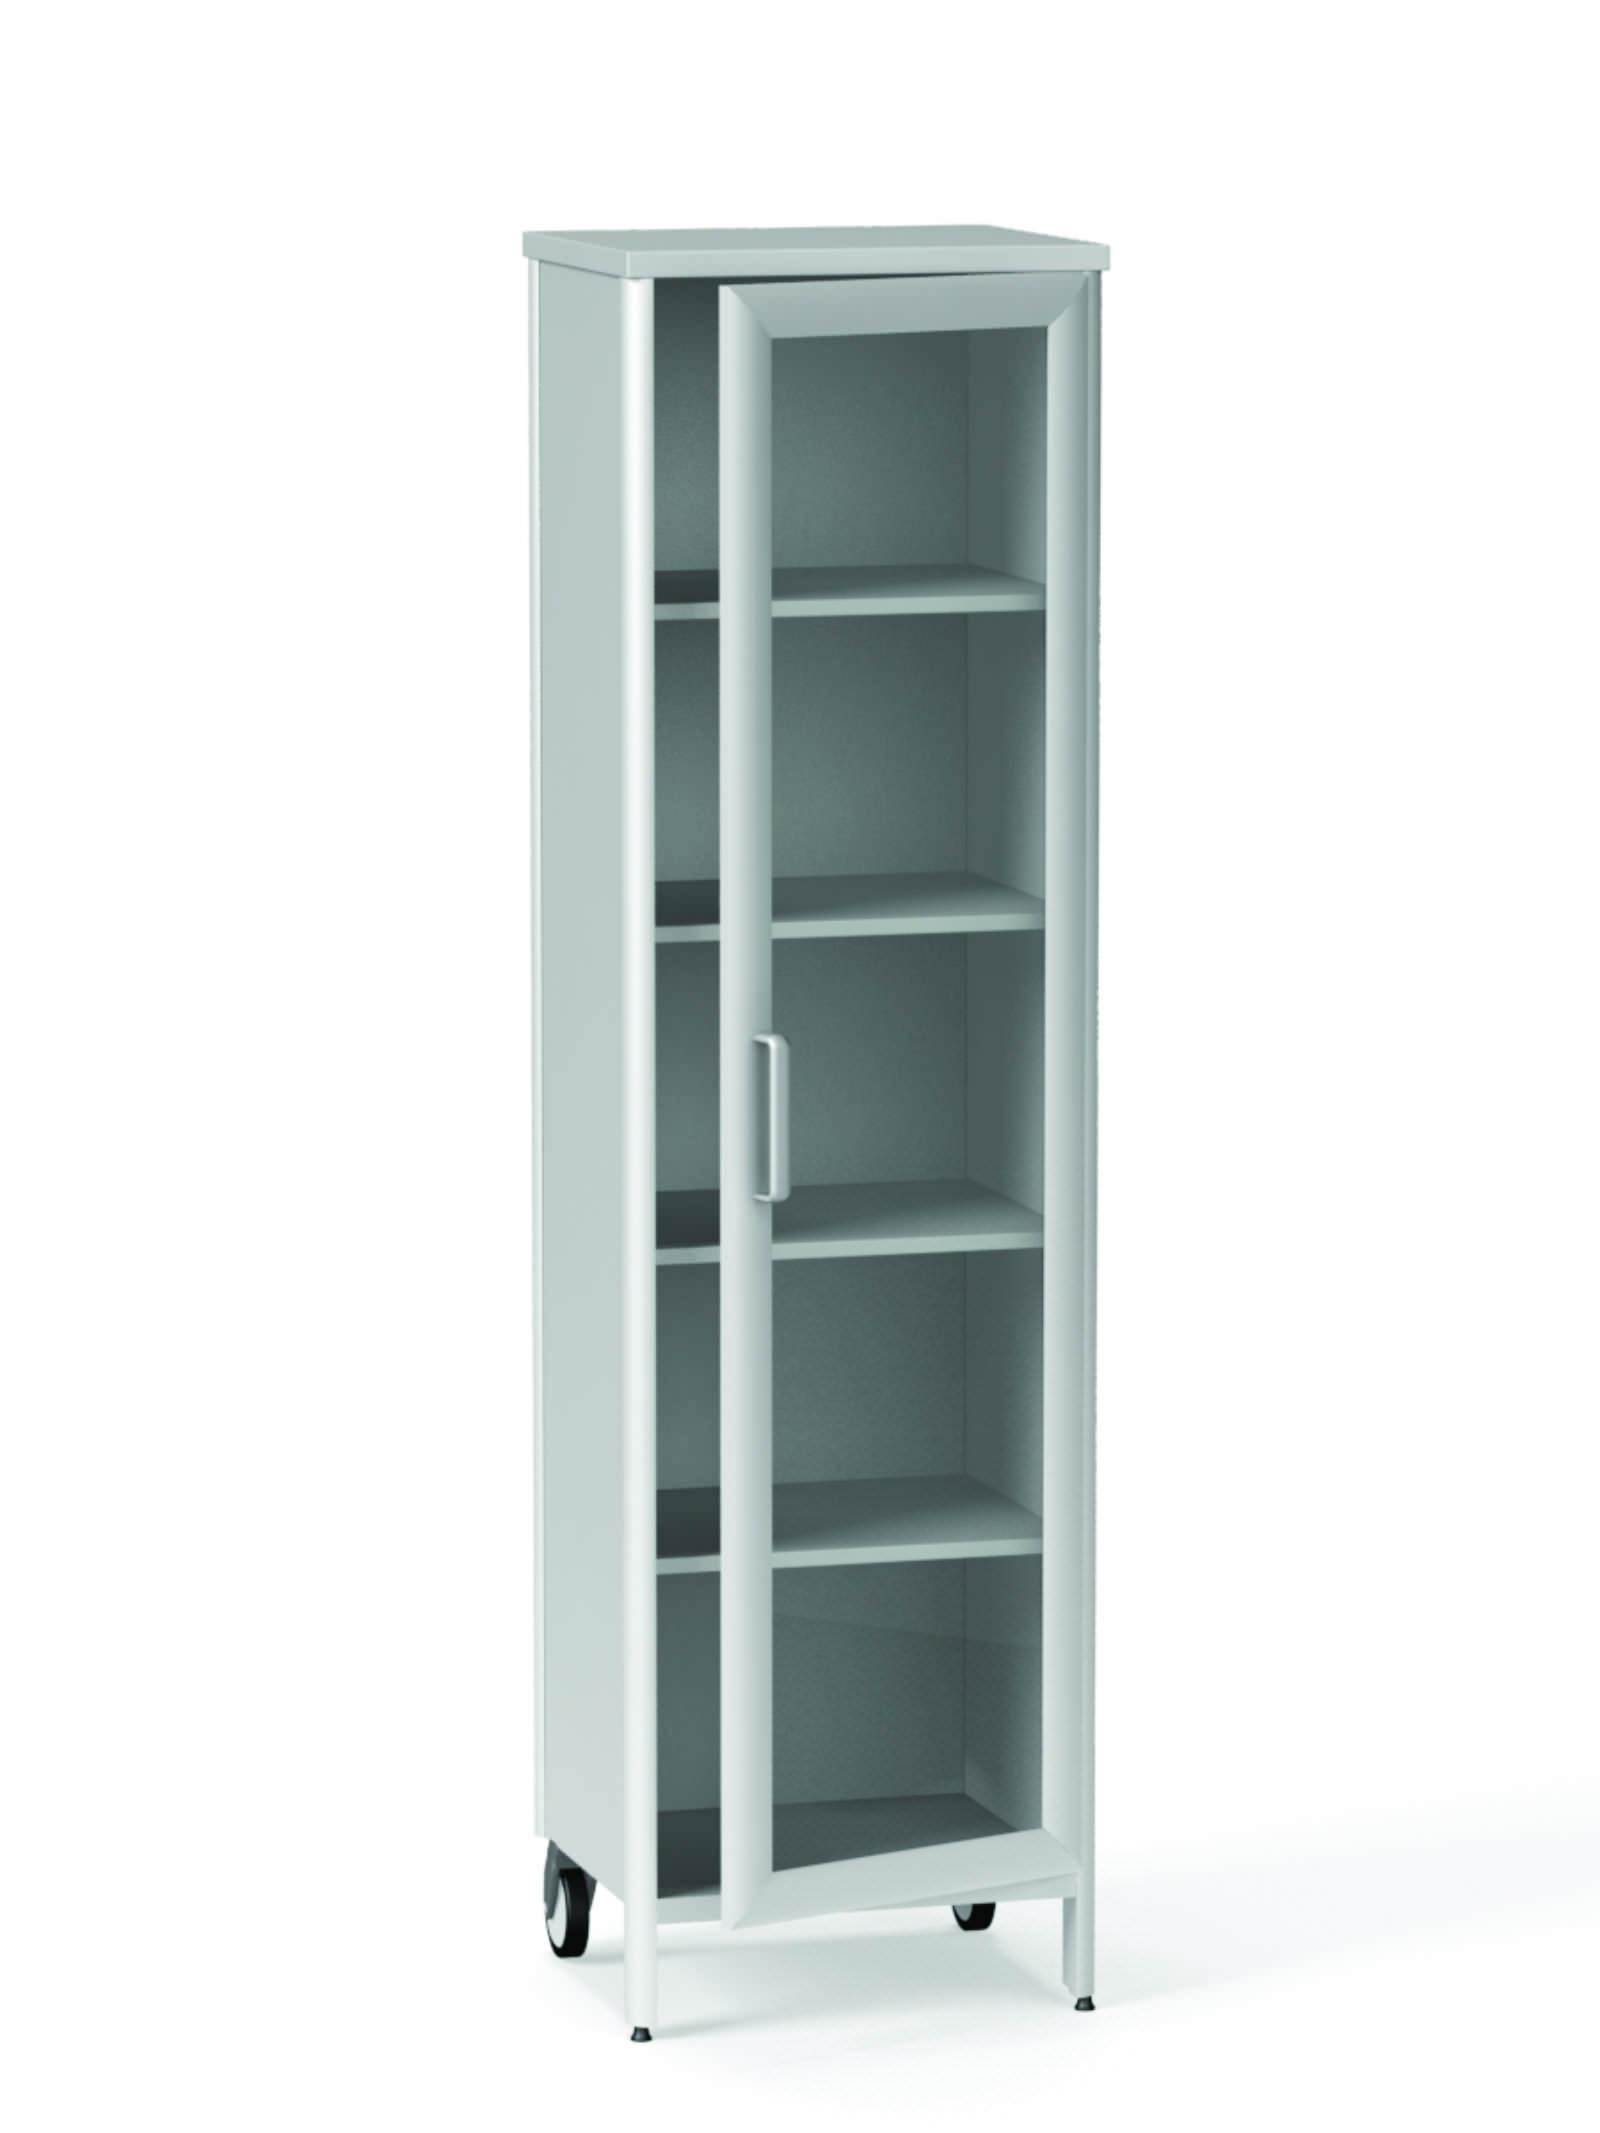 Медицинский шкаф ДМ-3-001-01